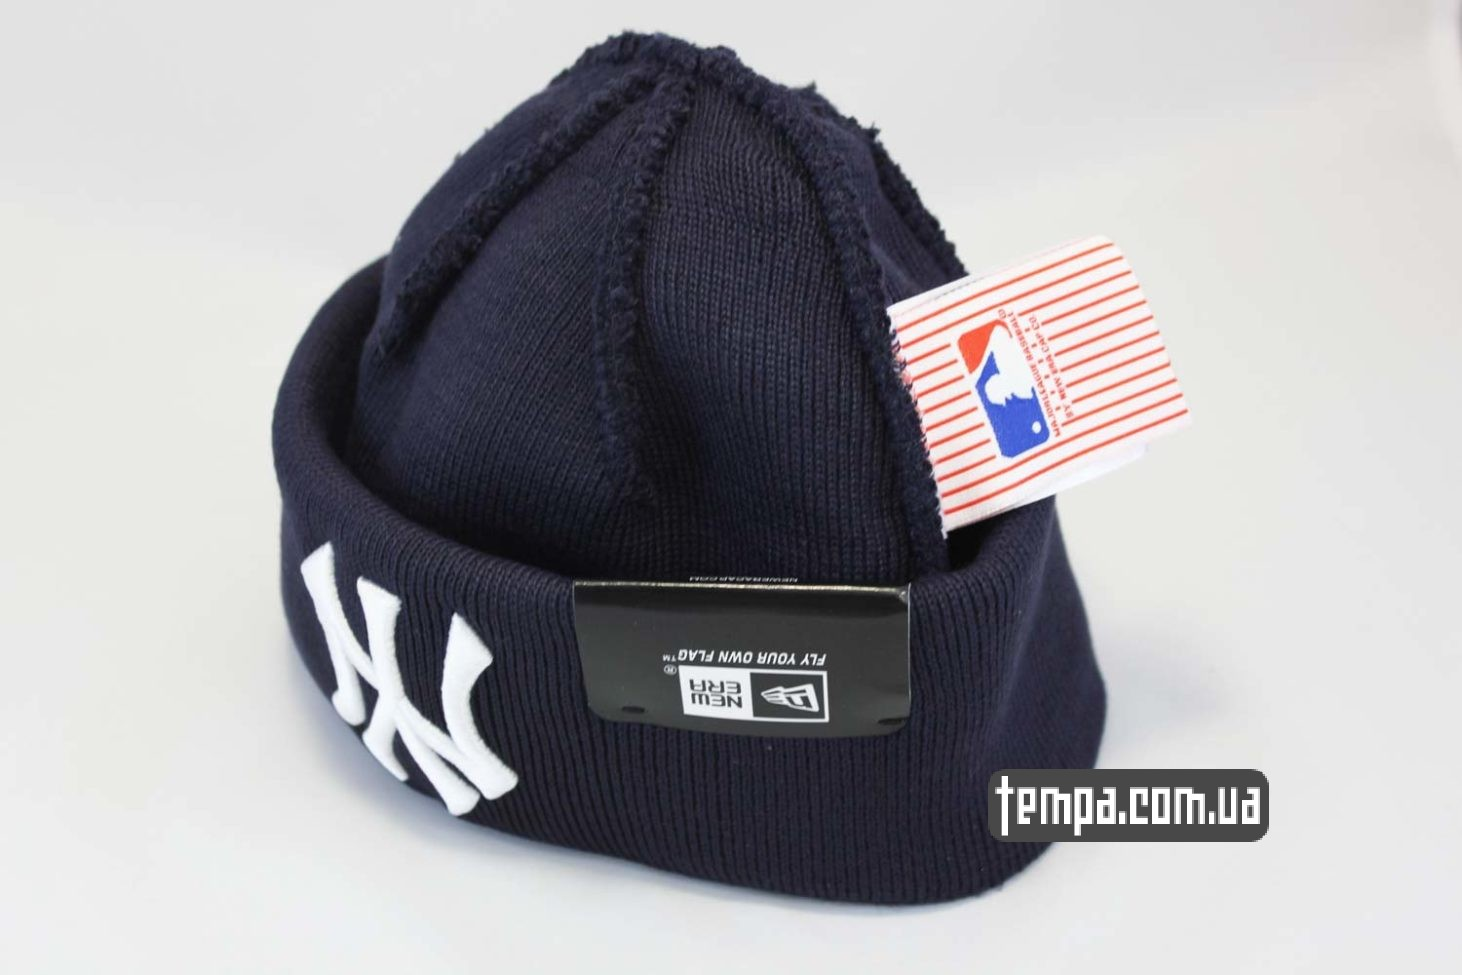 купить оригинальную шапка beanie New York Yankees New Era темно-синяя